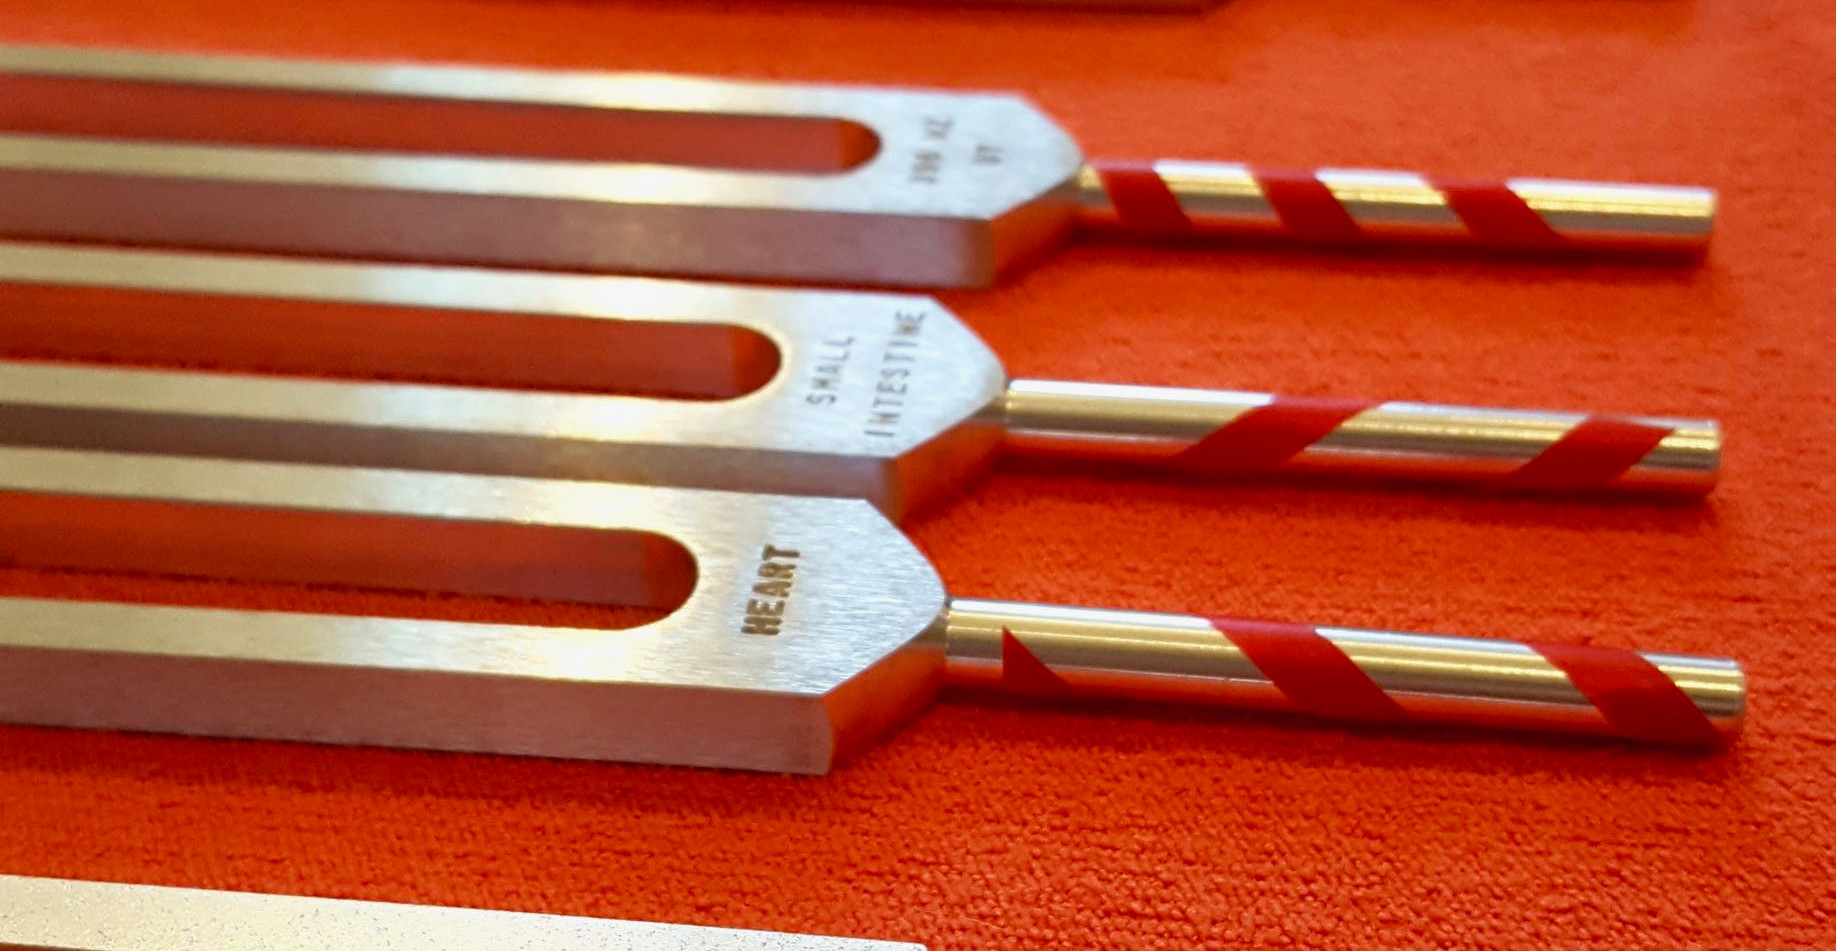 Miyuki M Tuning Forks - 1 (5).jpg